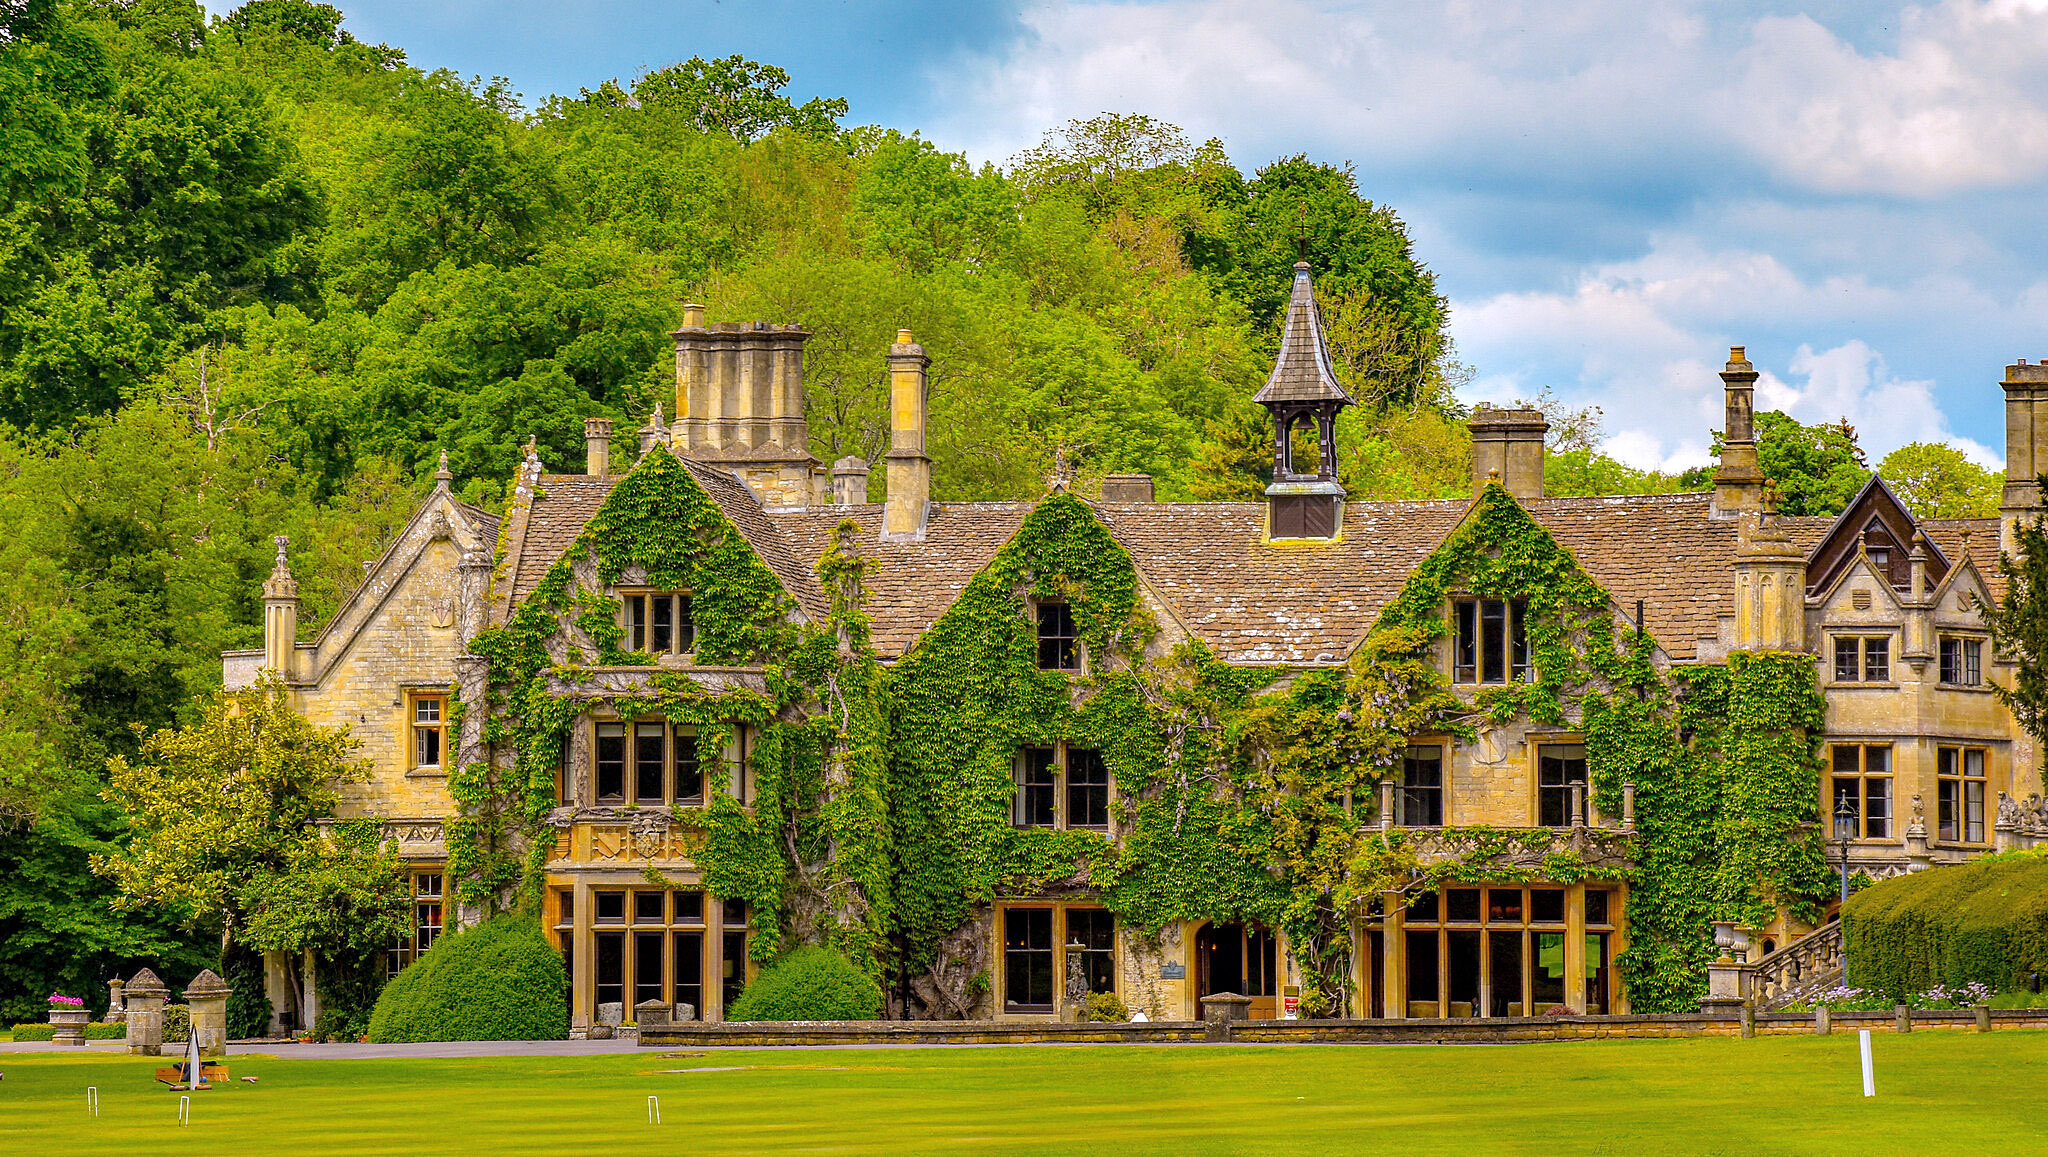 Manor House, Castle Combe by Jonathon Shkolny.jpg